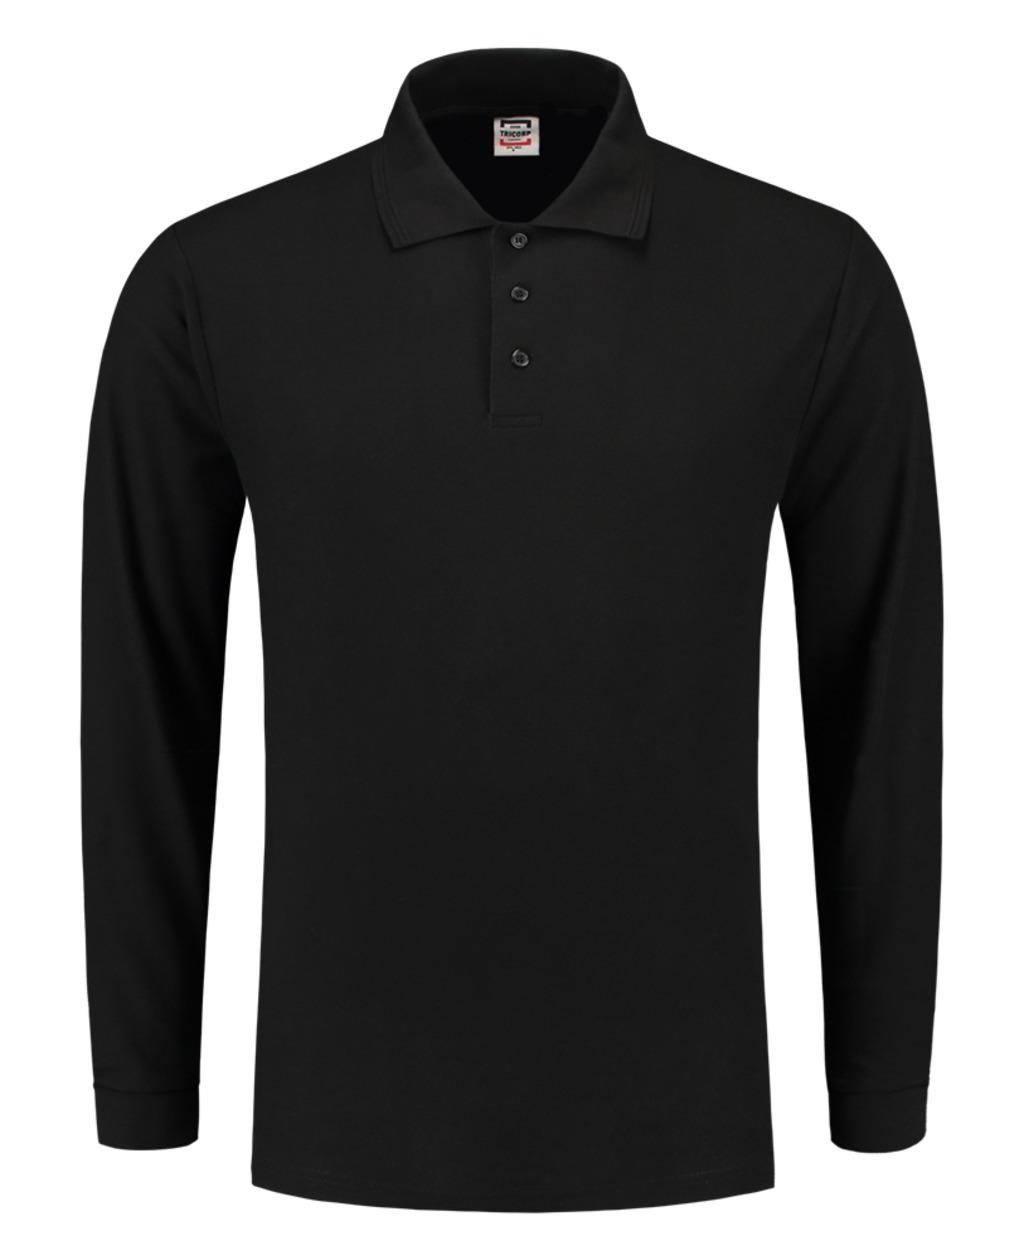 PPKL180 Poloshirt